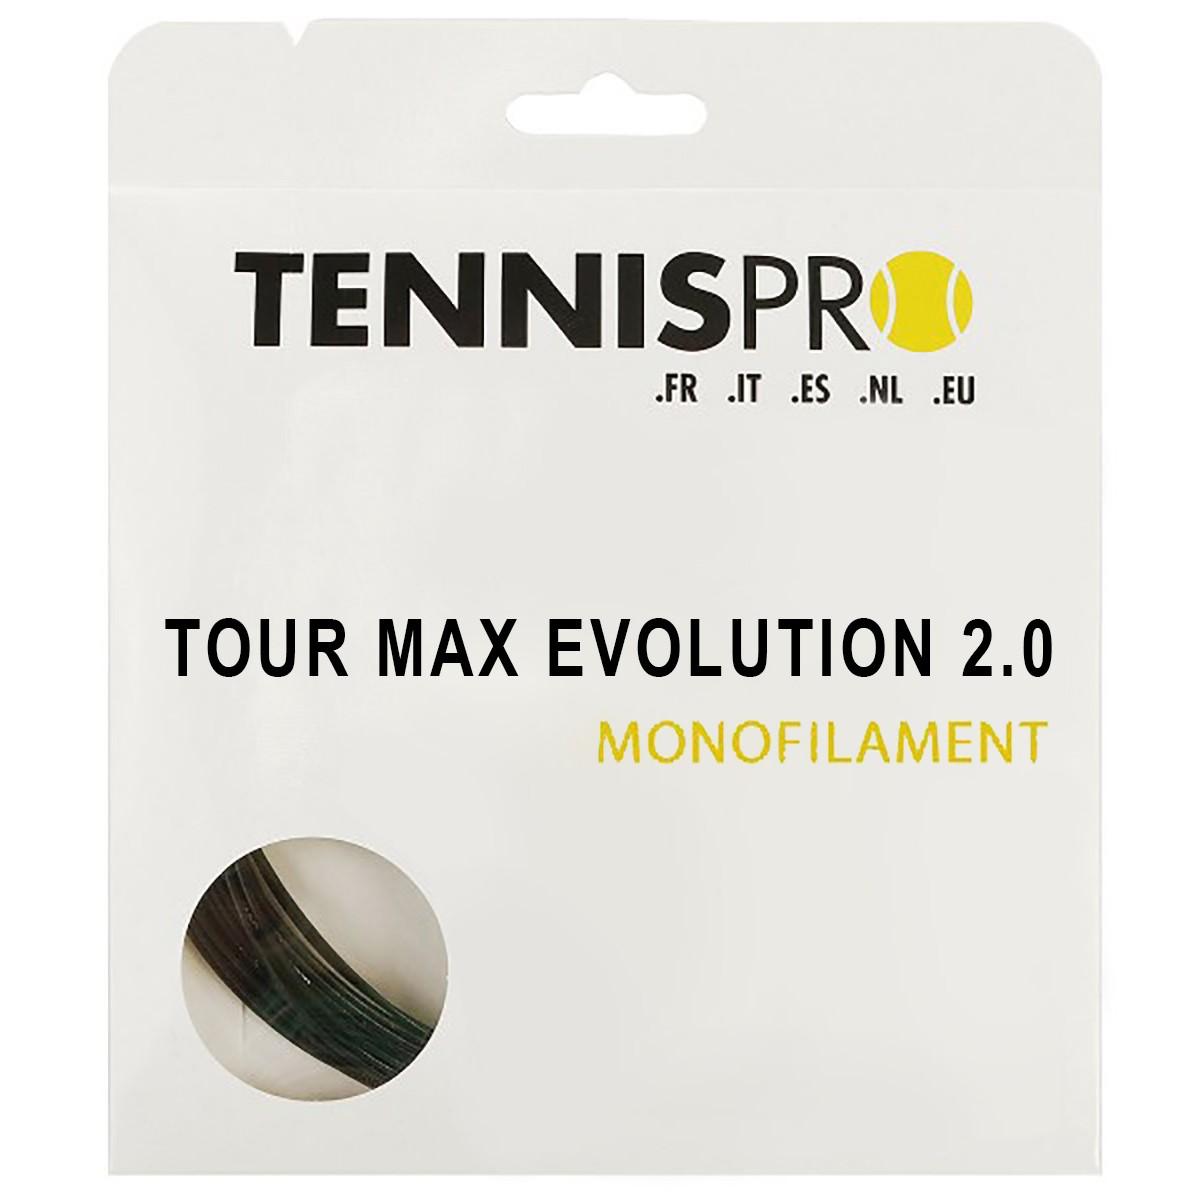 TENNISPRO TOUR MAX EVOLUTION 2.0 (12 METRES) STRING PACK